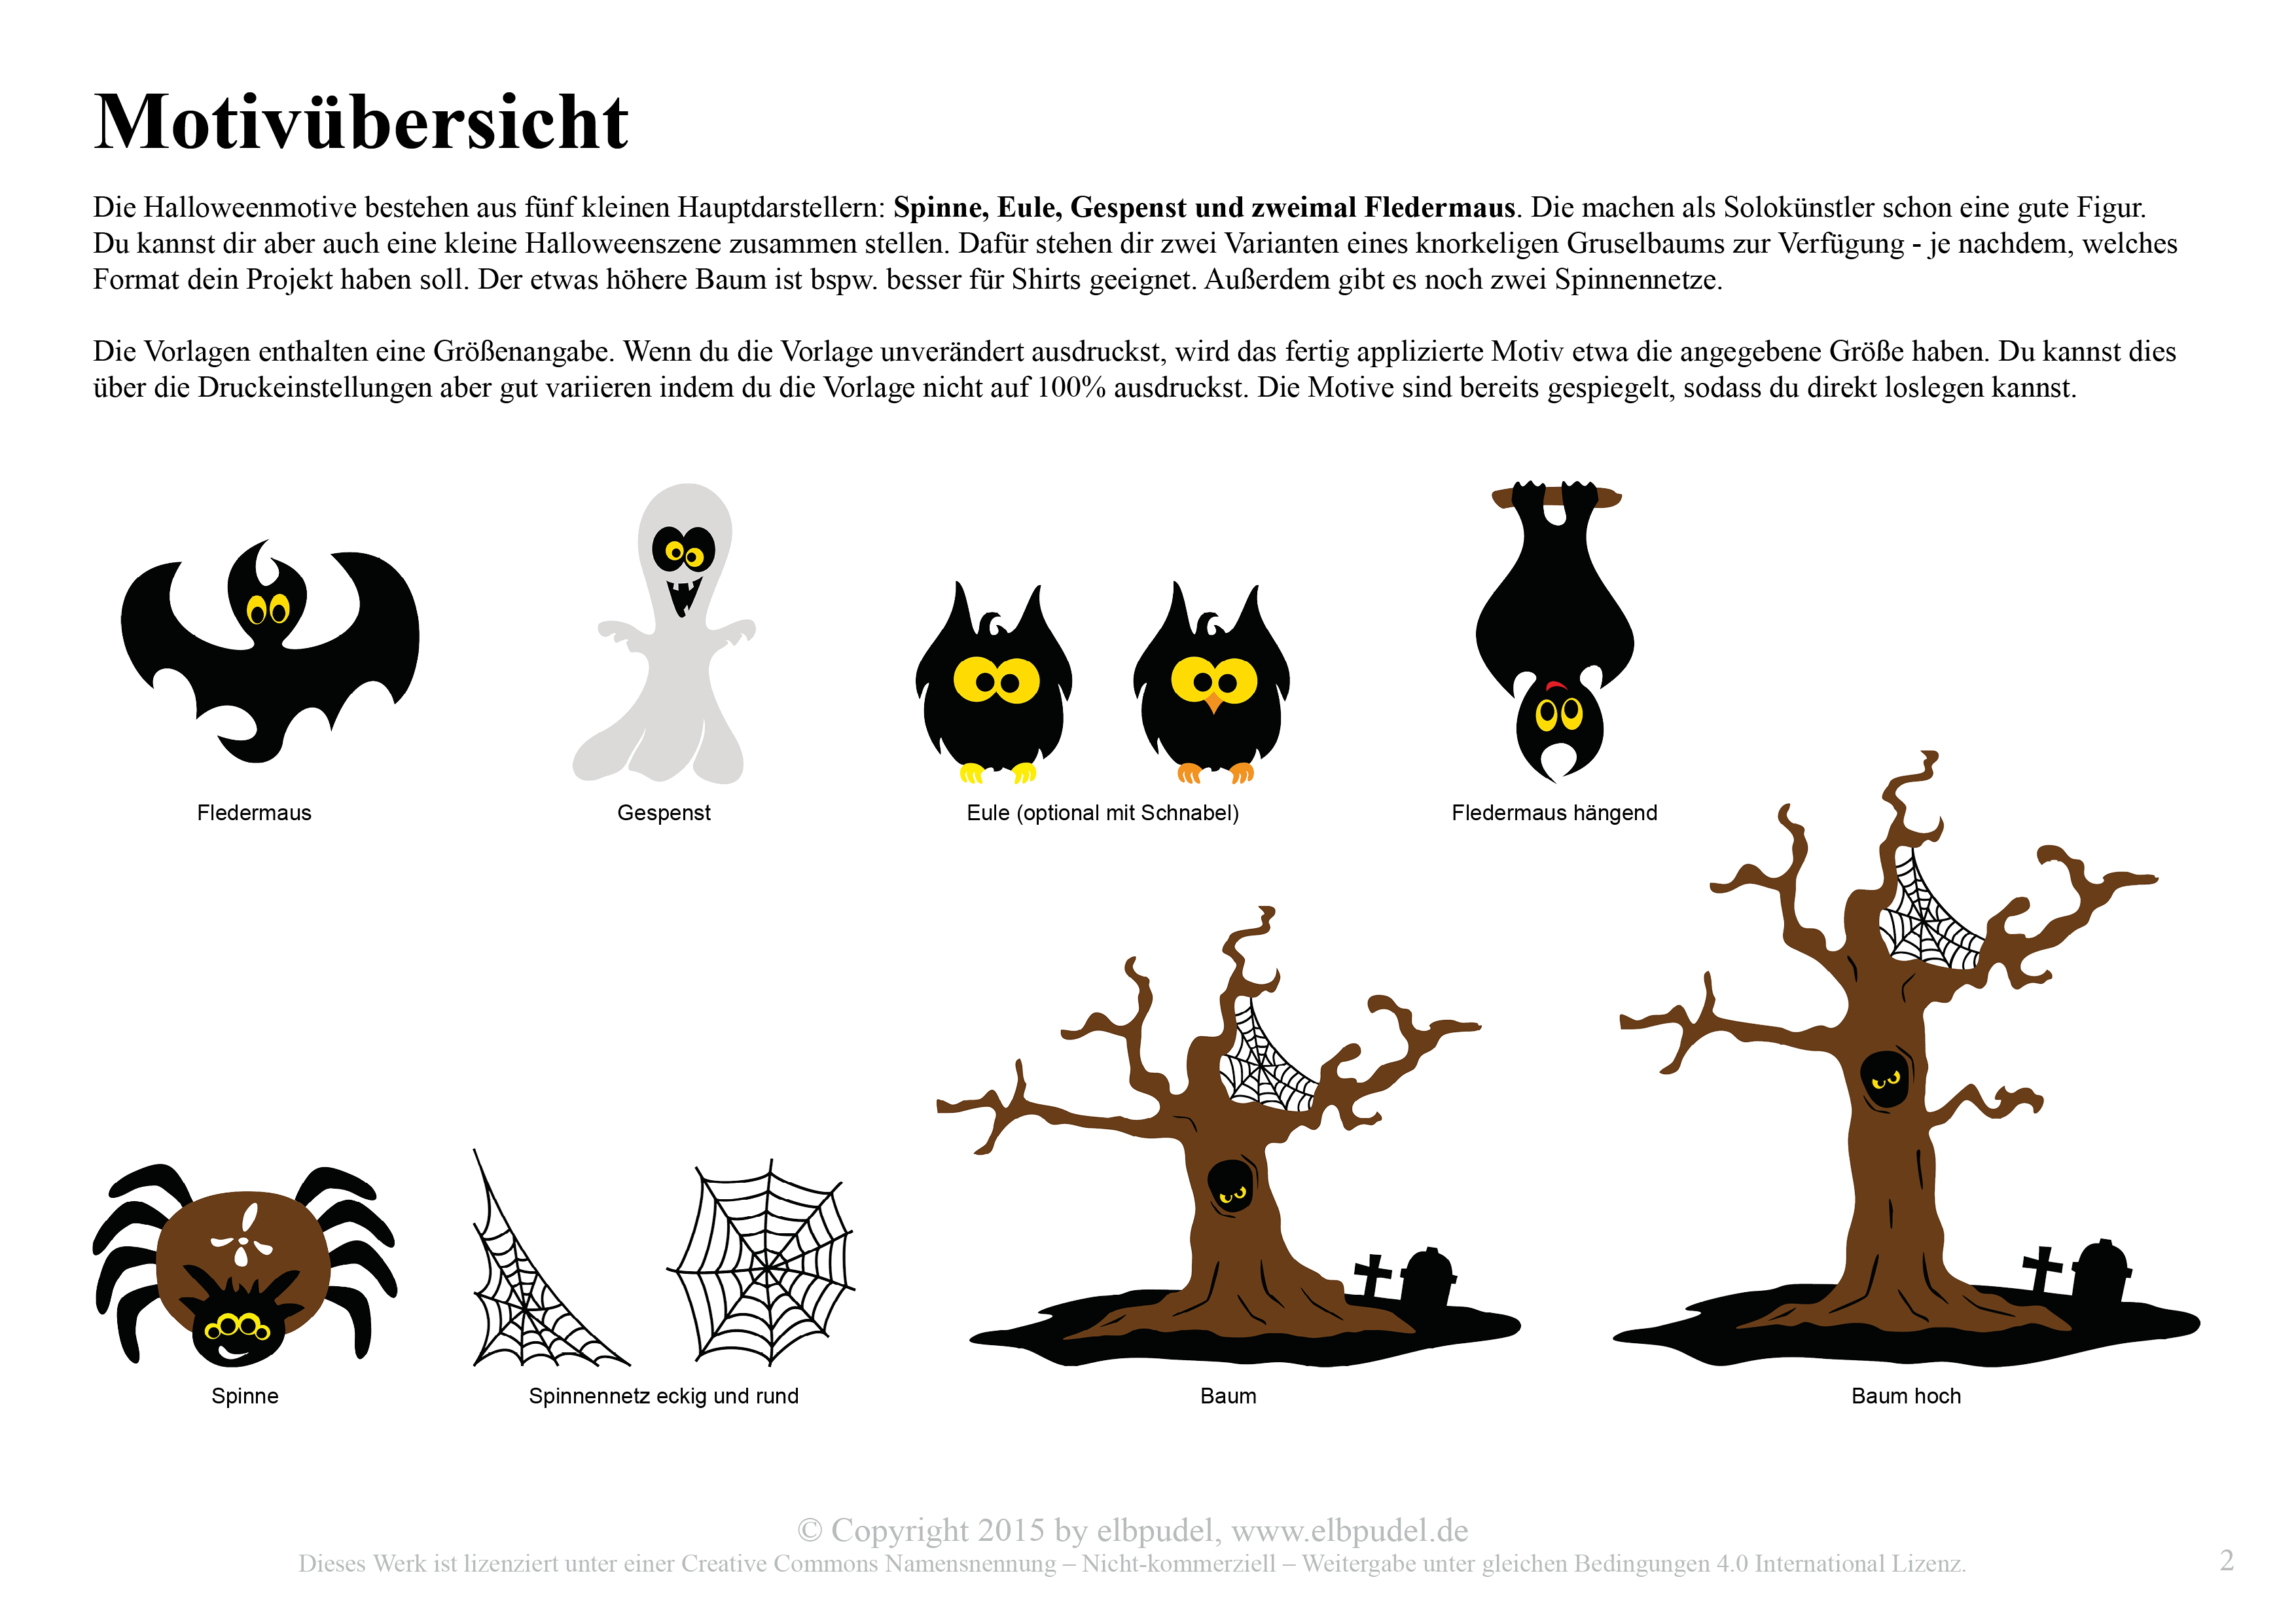 elbpudel_Halloween_Appli2